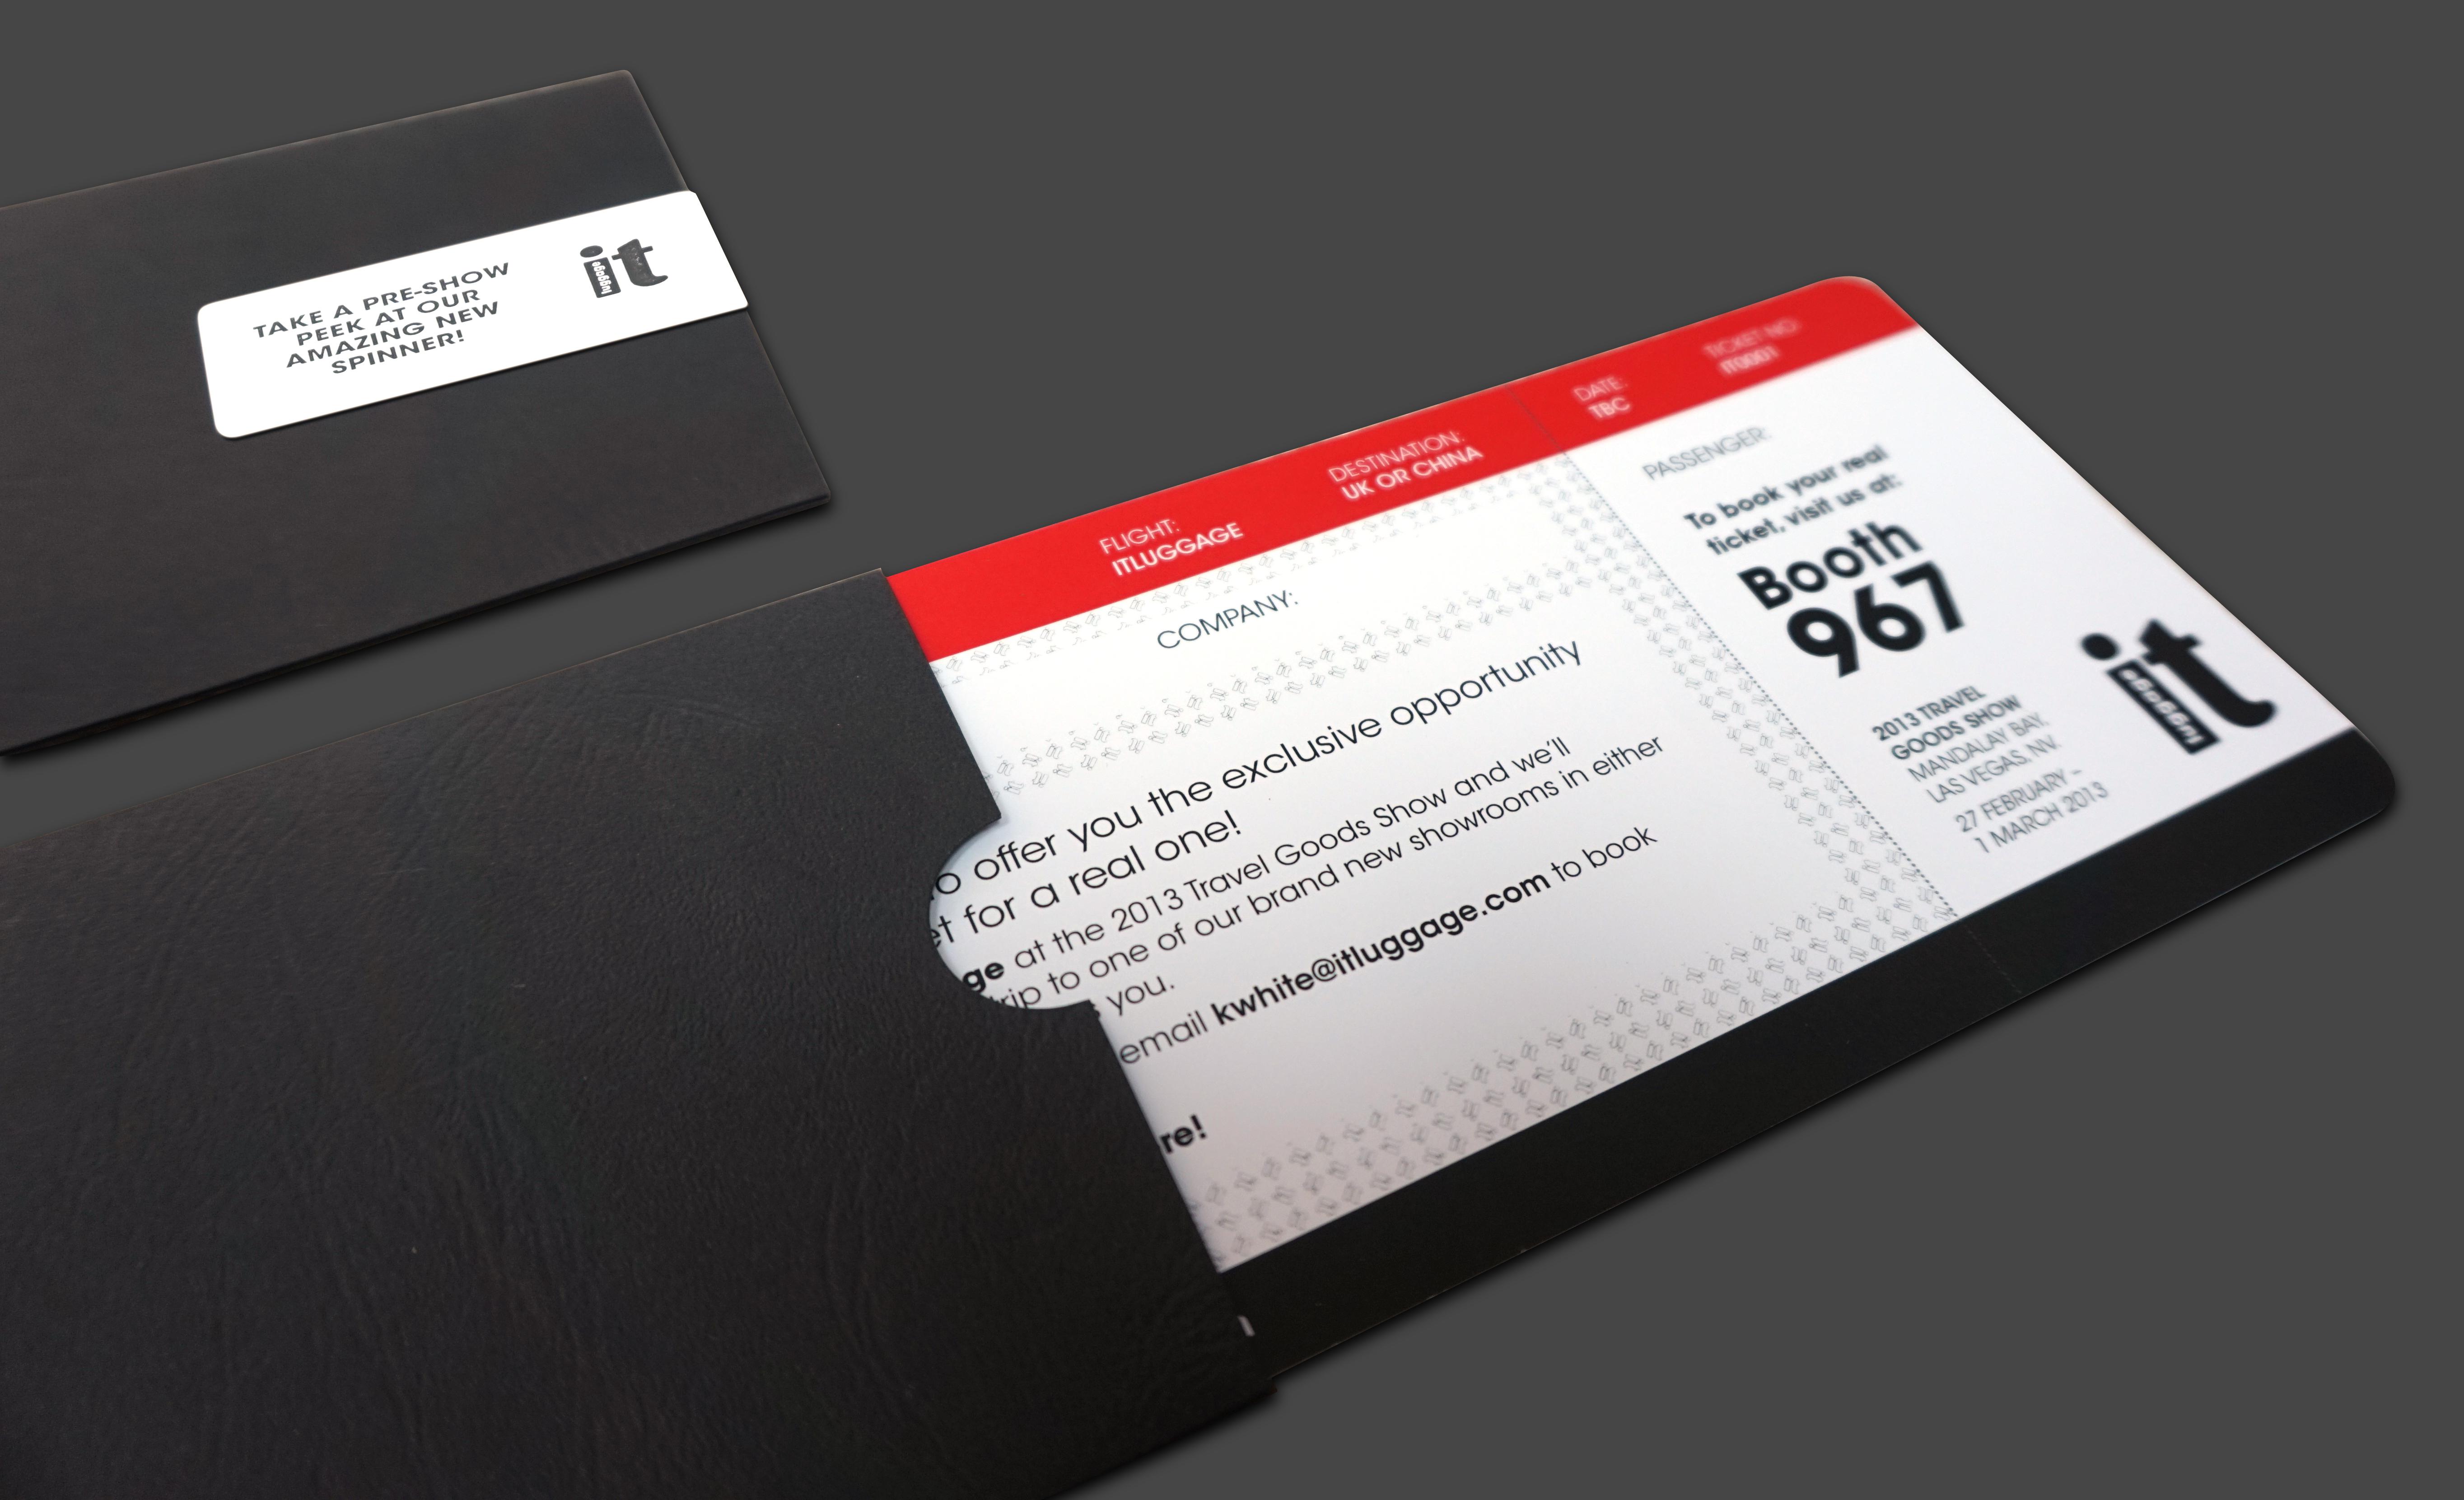 IT exhibition invite